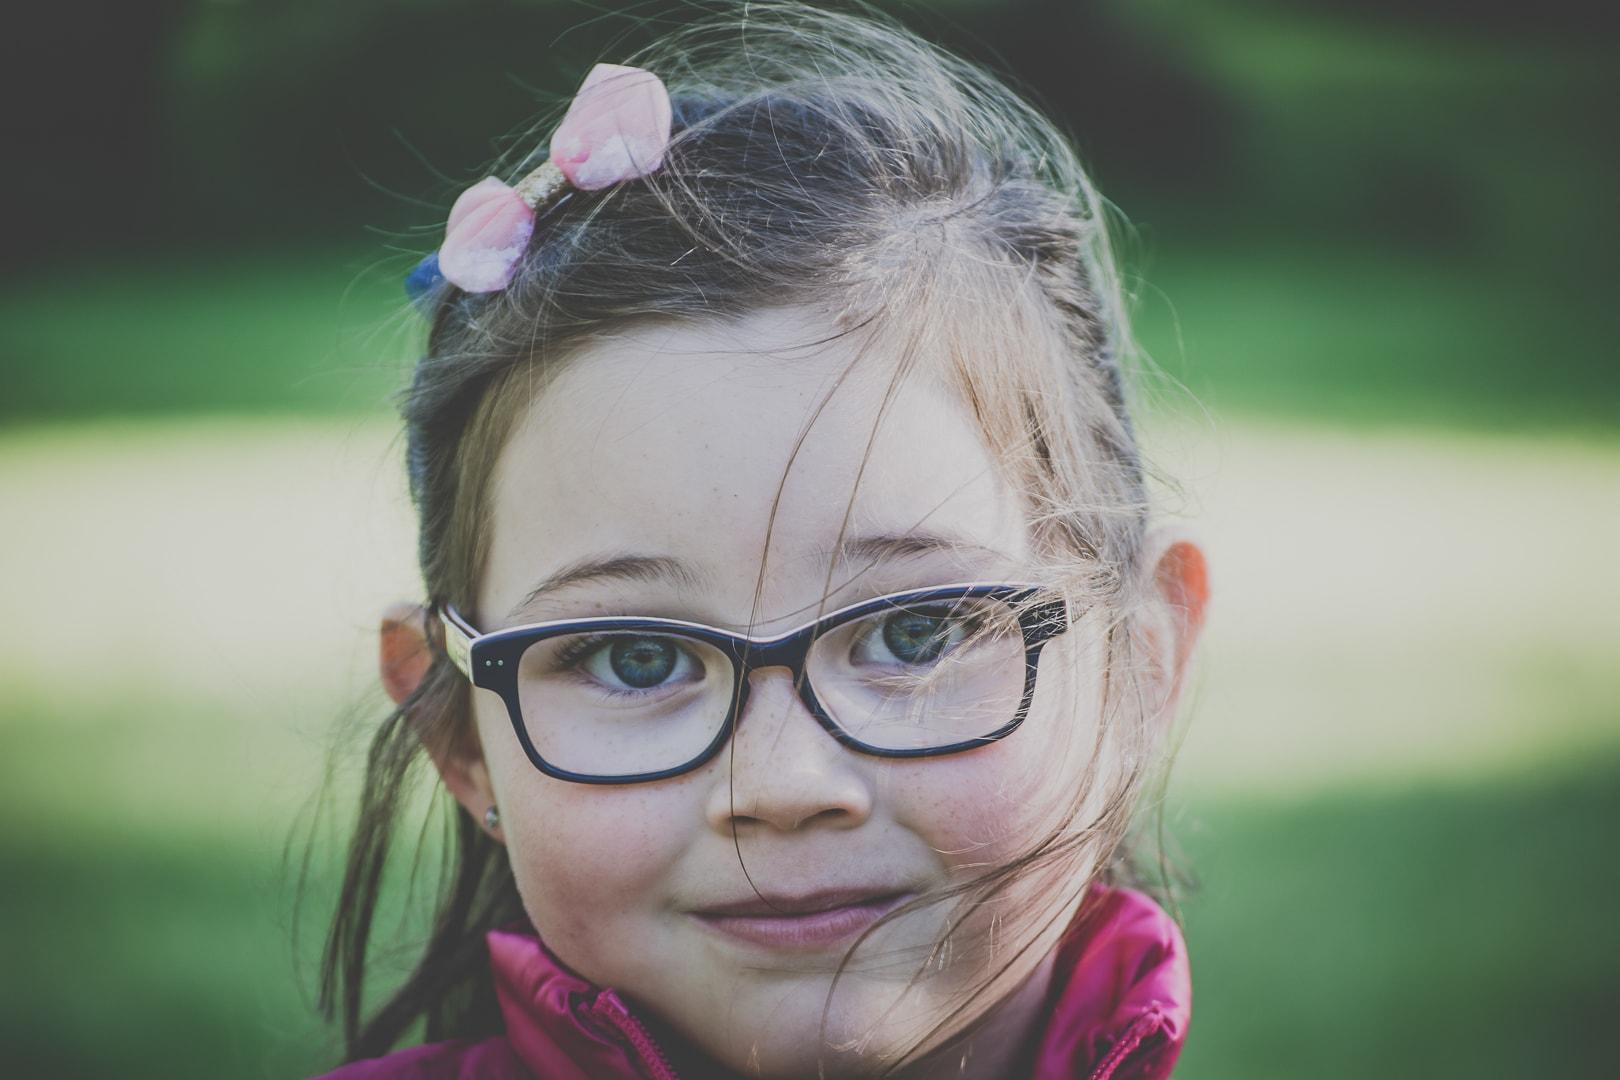 trezors-photography-photographe-professionnel-toulouse-31-enfance-seance-famille-lifestyle (4)